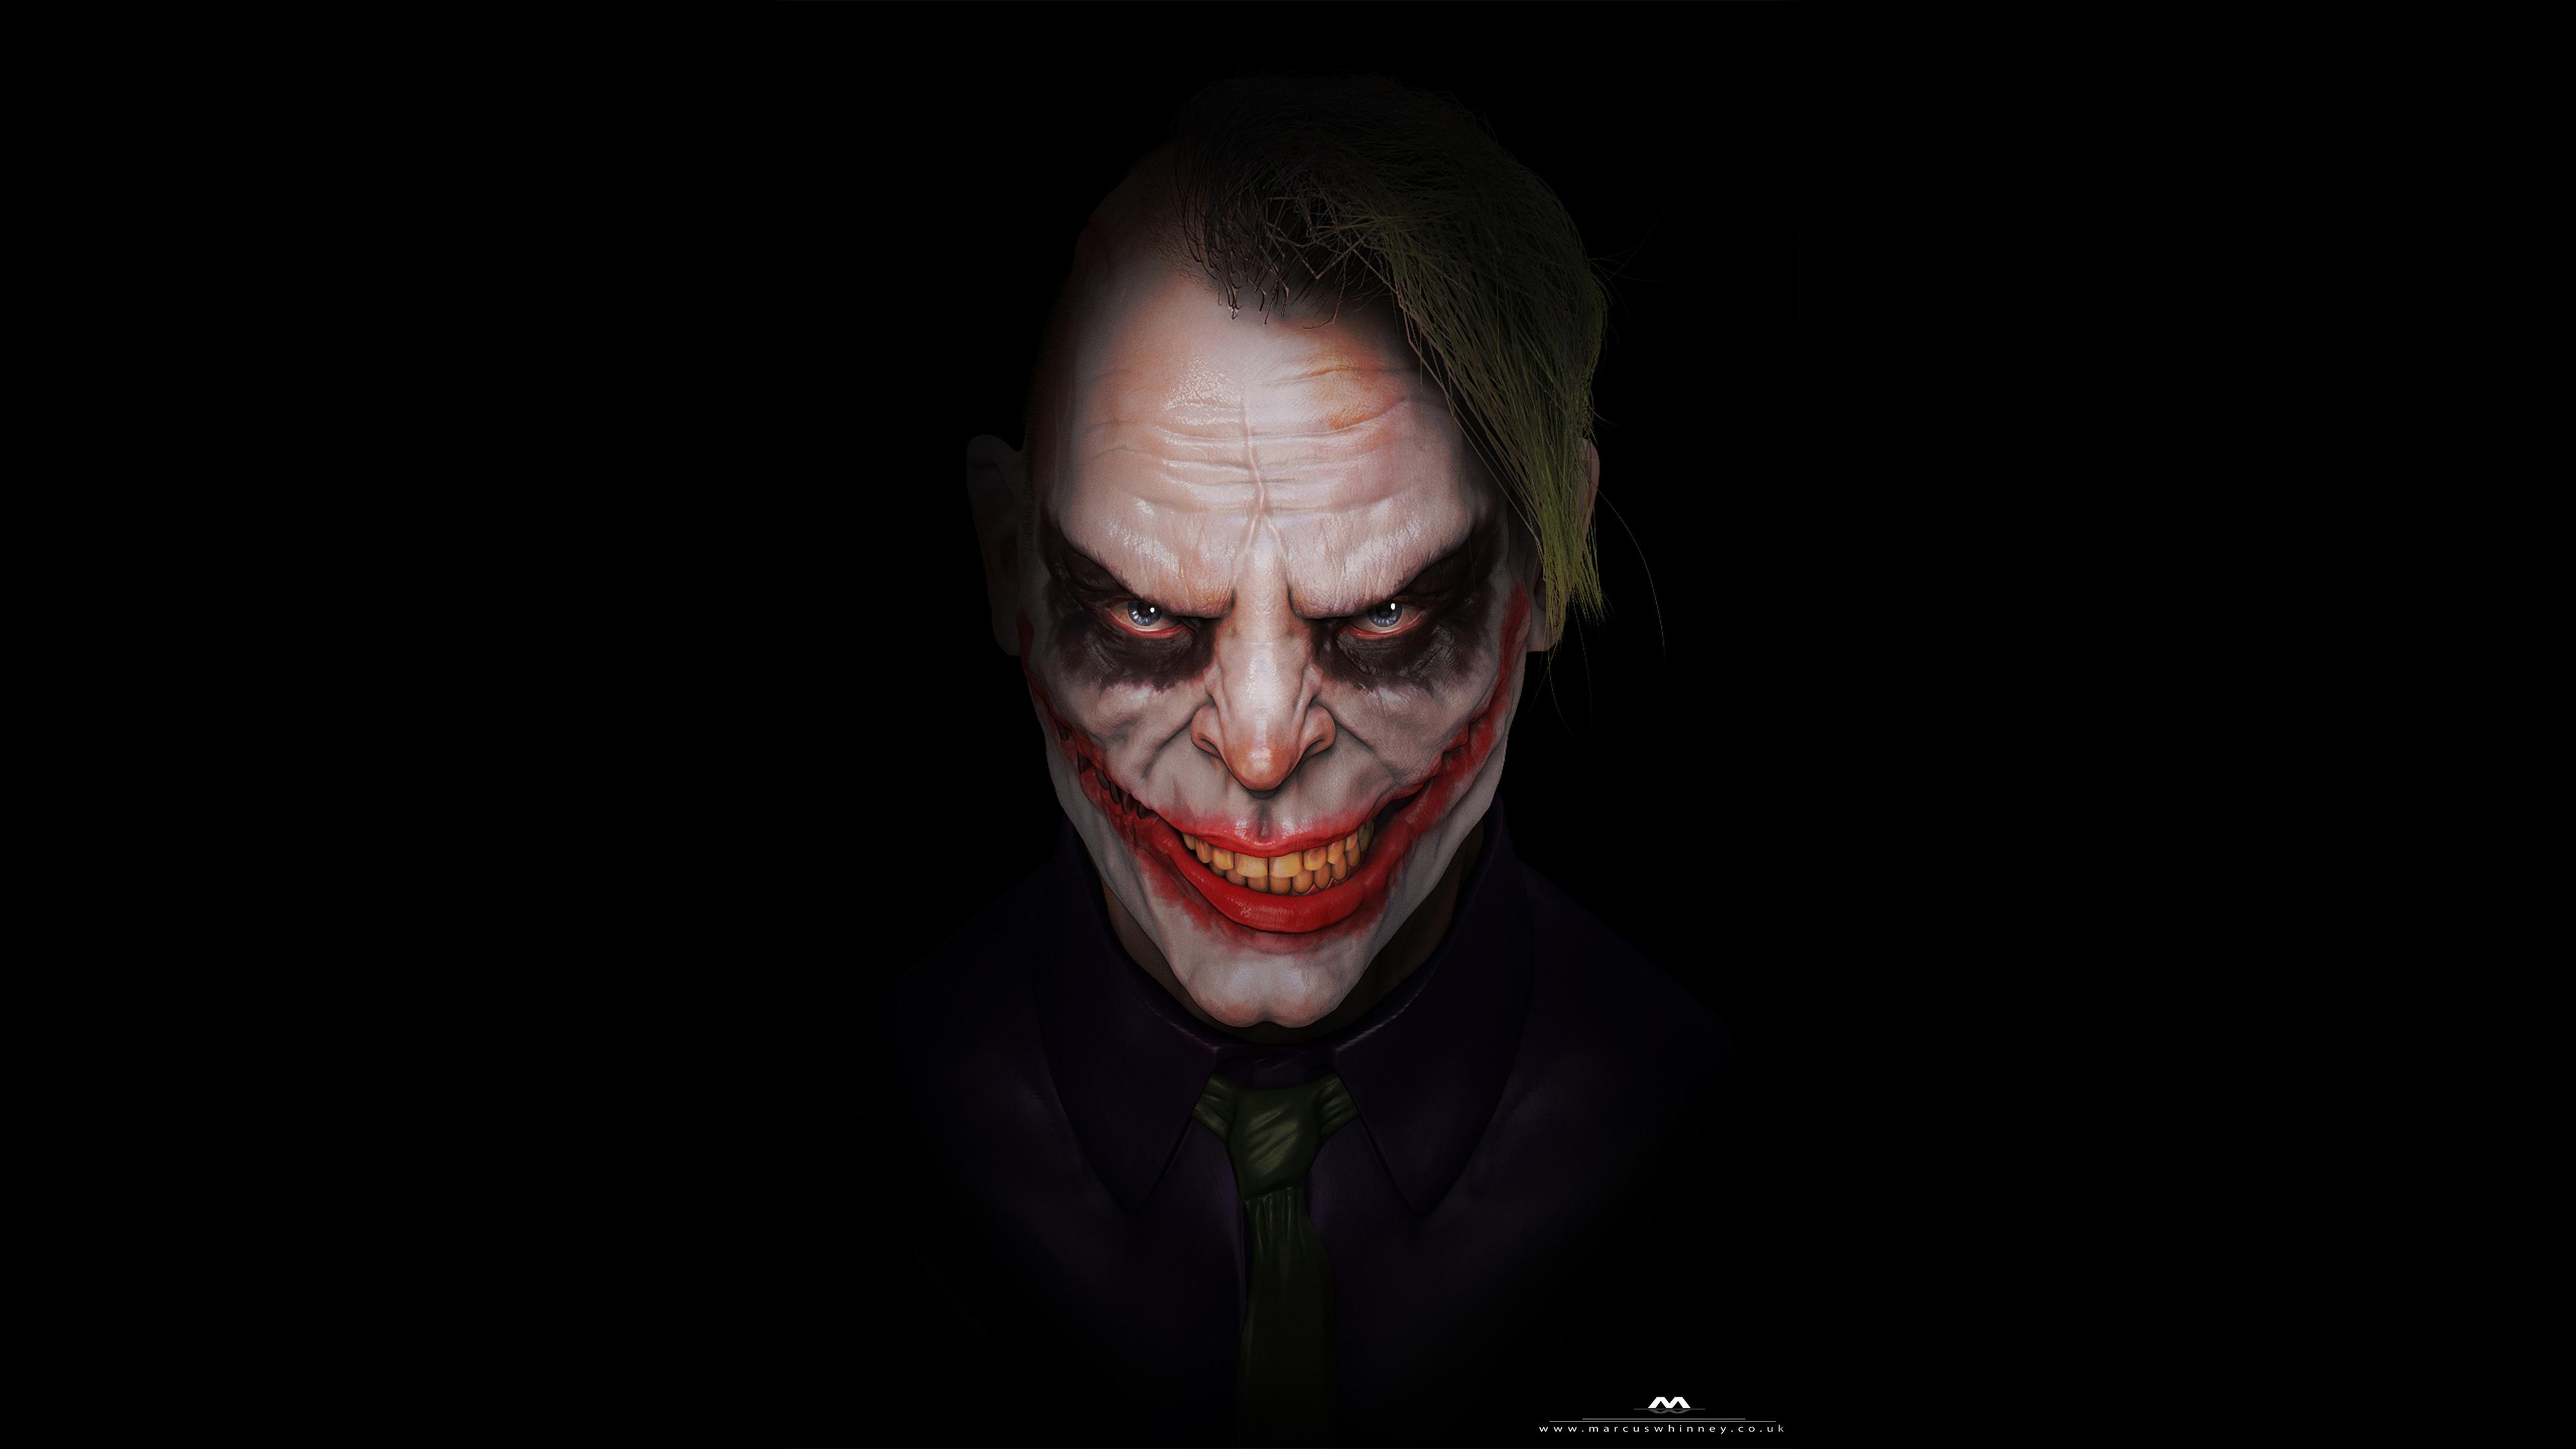 Scary Joker 4k Hd Superheroes 4k Wallpapers Images Backgrounds